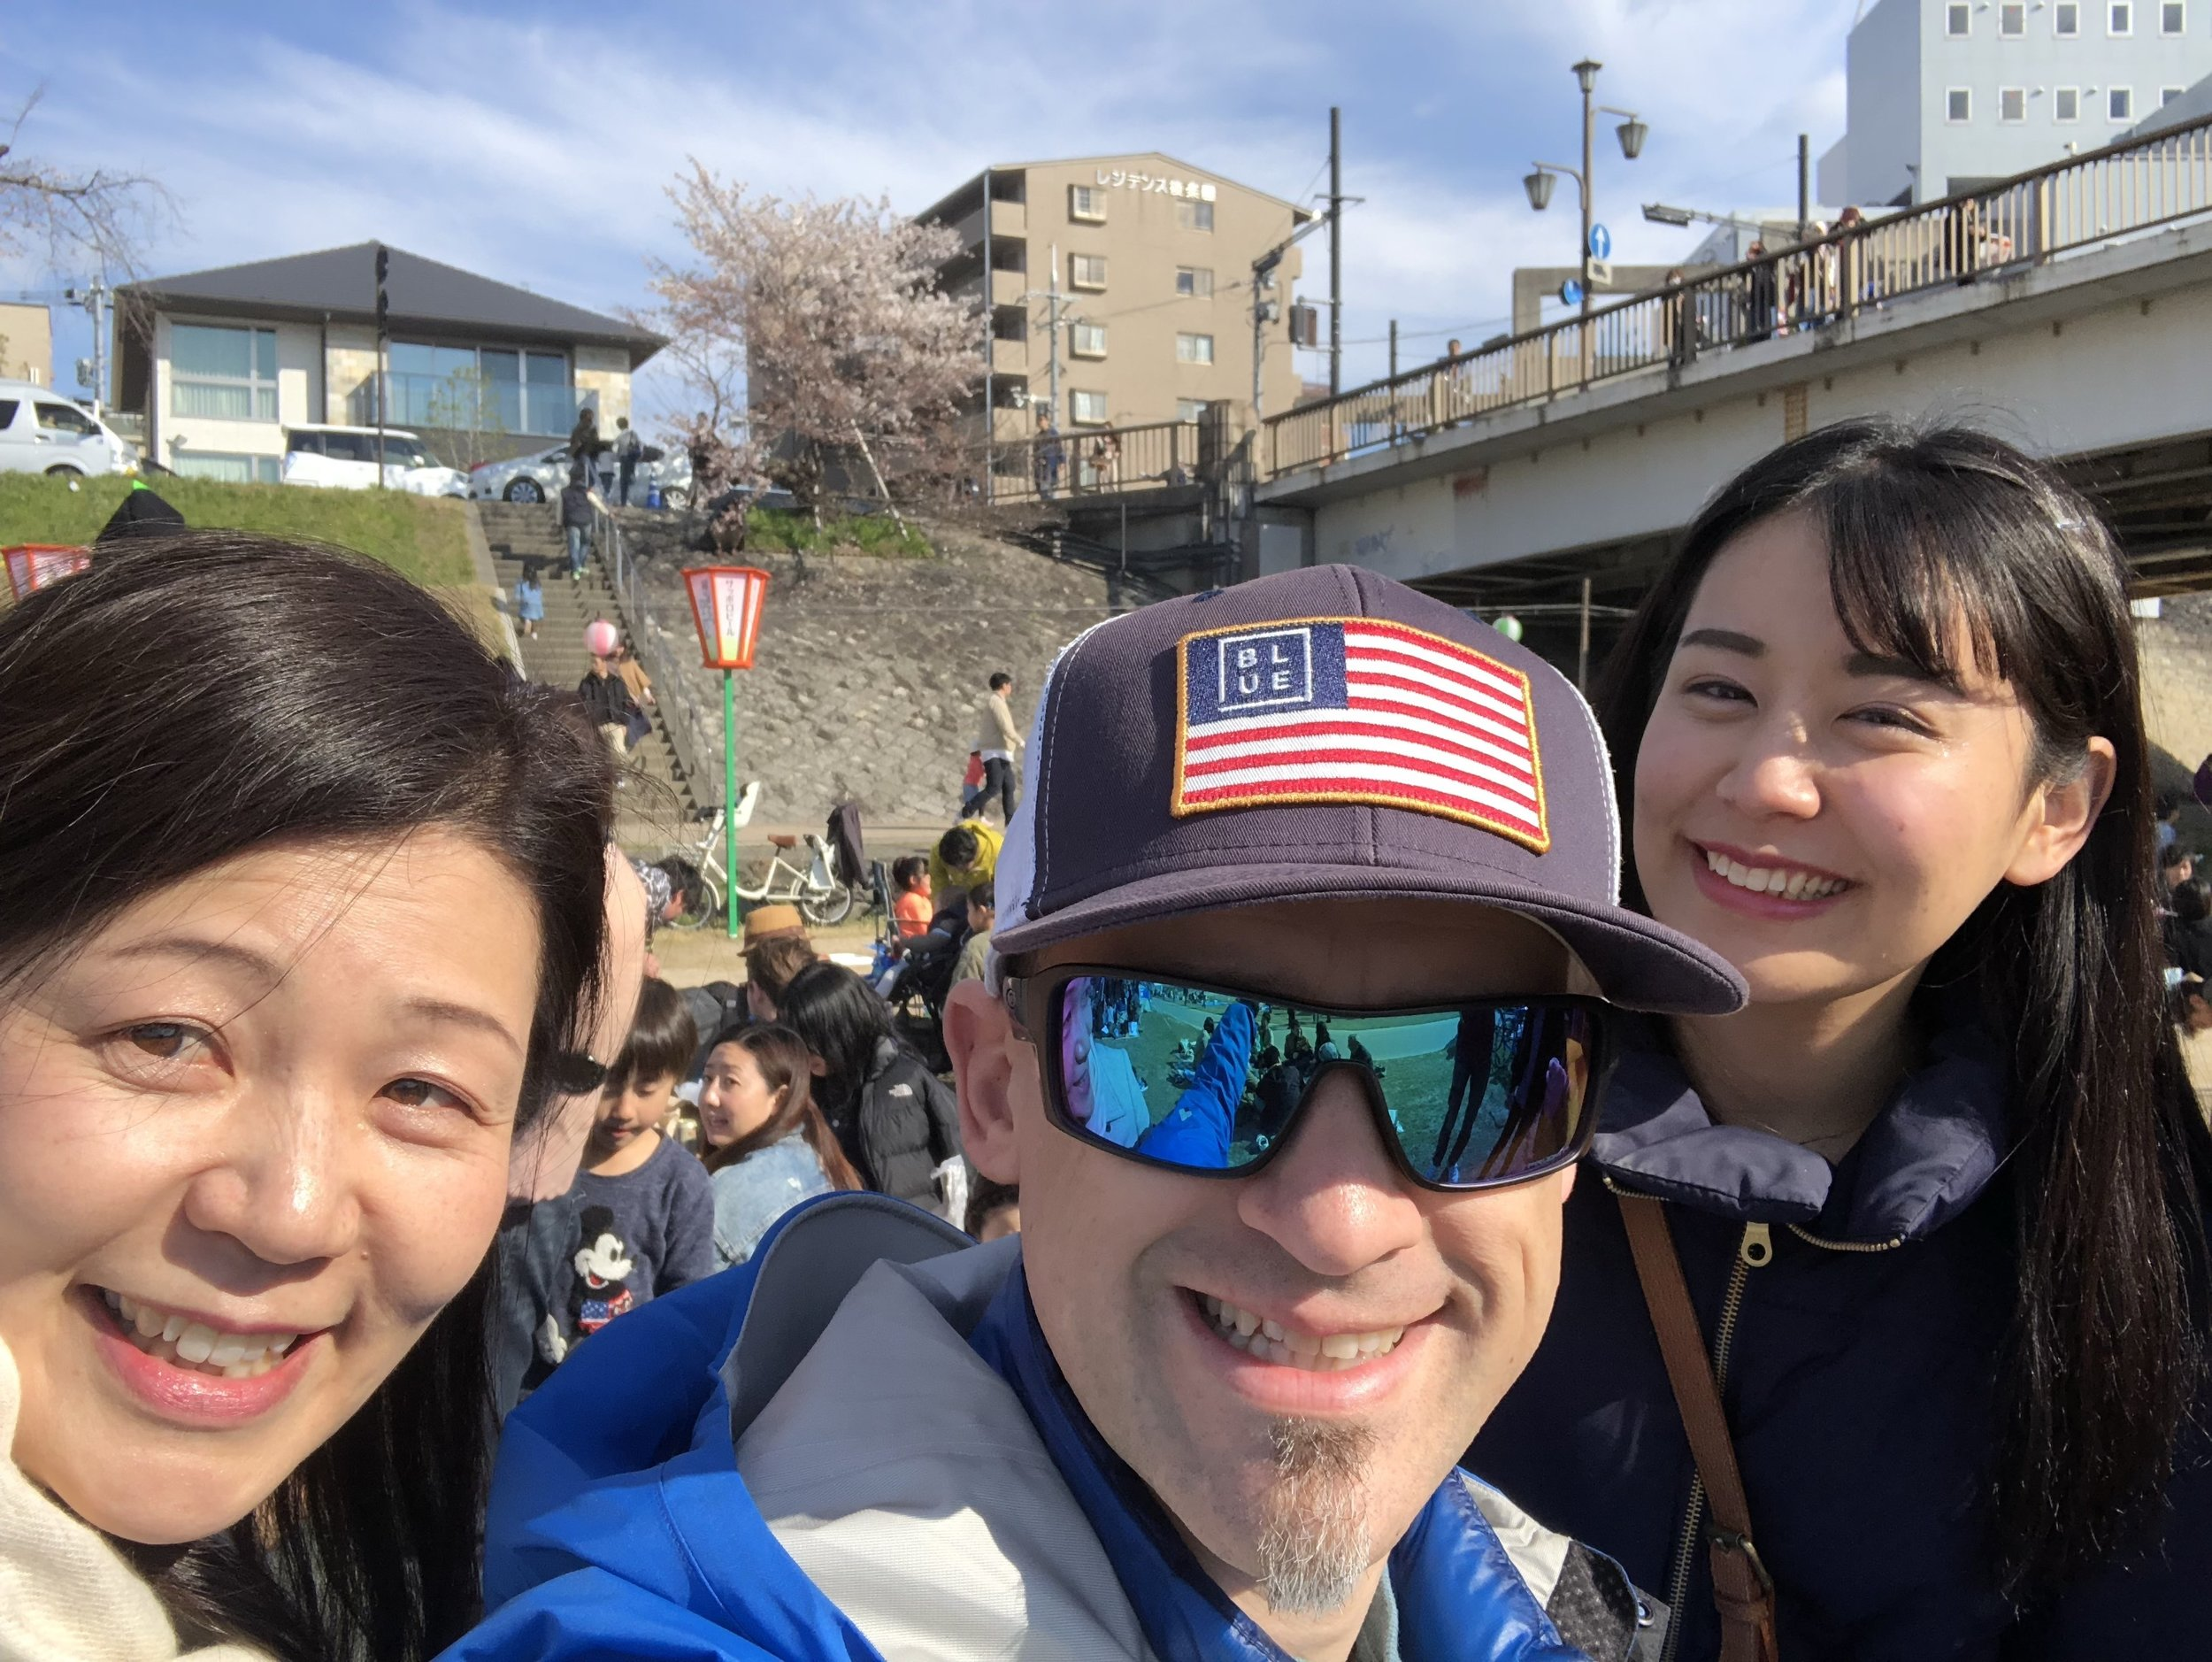 2019-03-31_15-31-19_IMG_8284.JPG